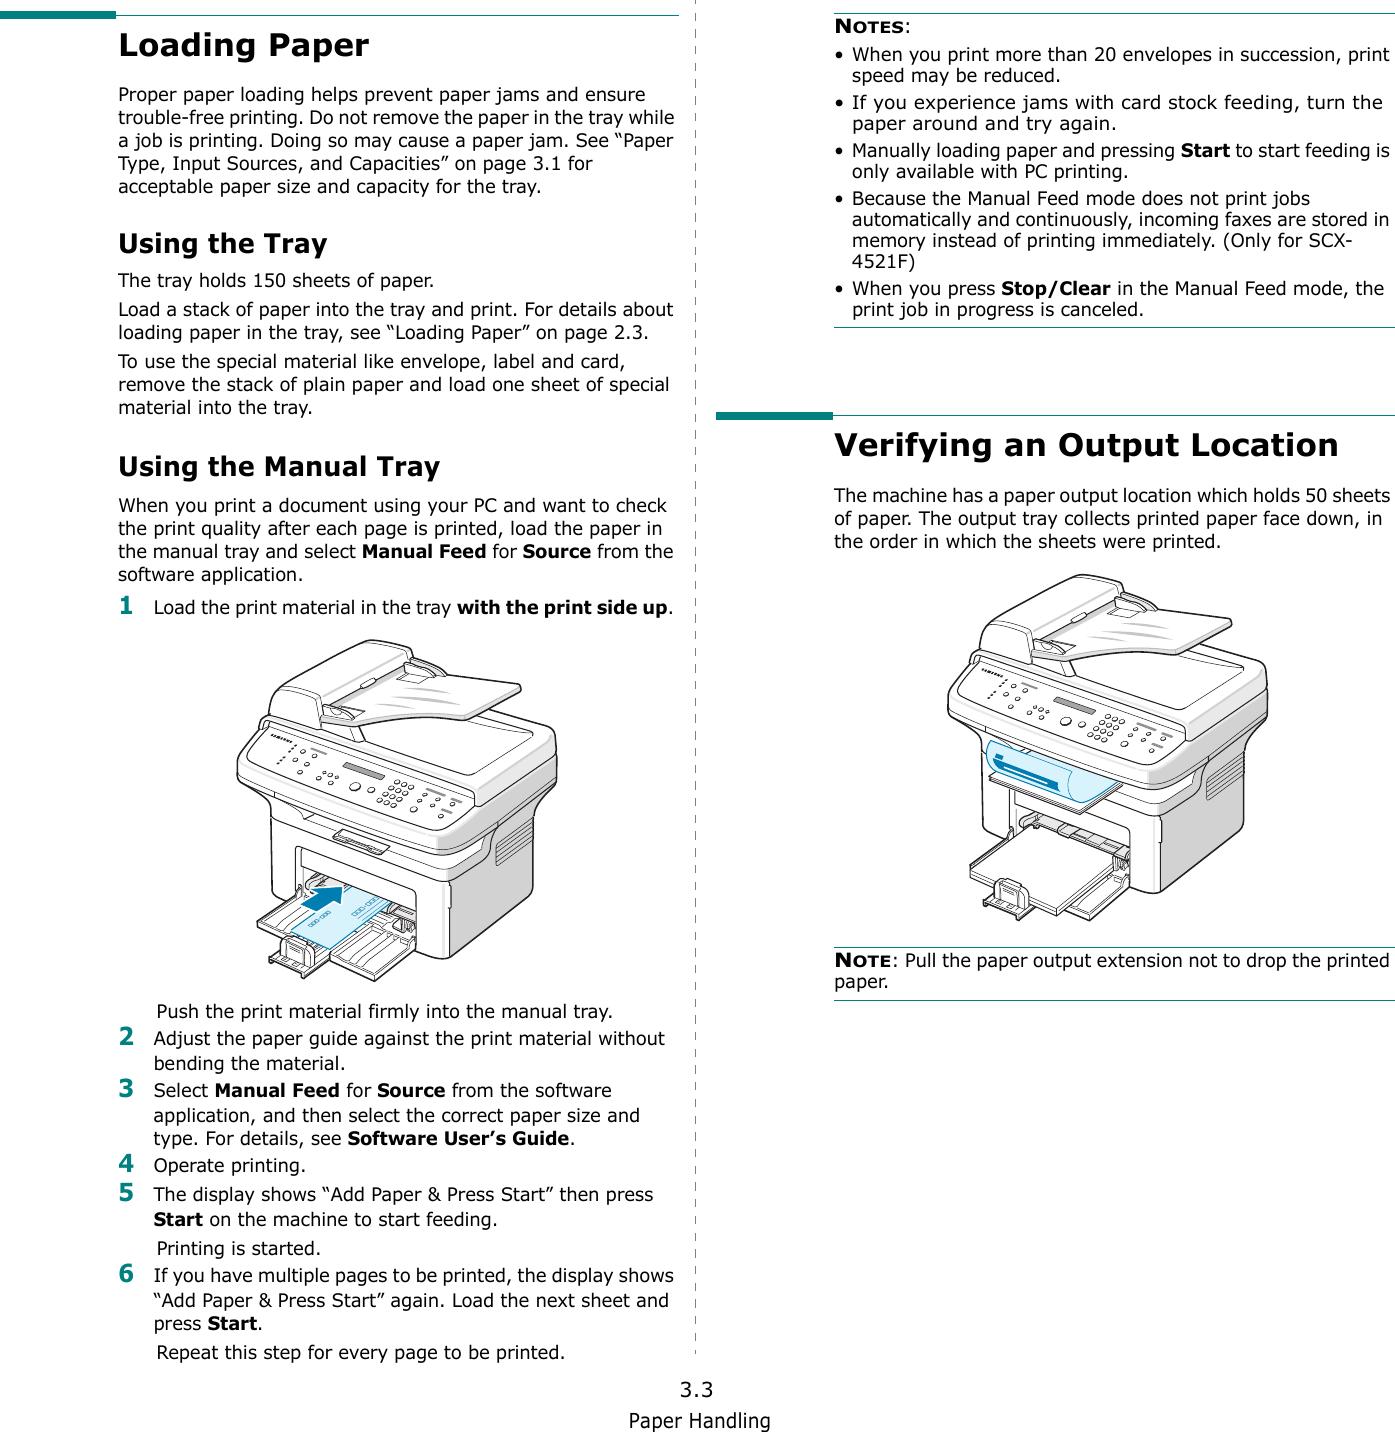 Samsung All In One Printer Scx 4321 Users Manual 4x17_EN